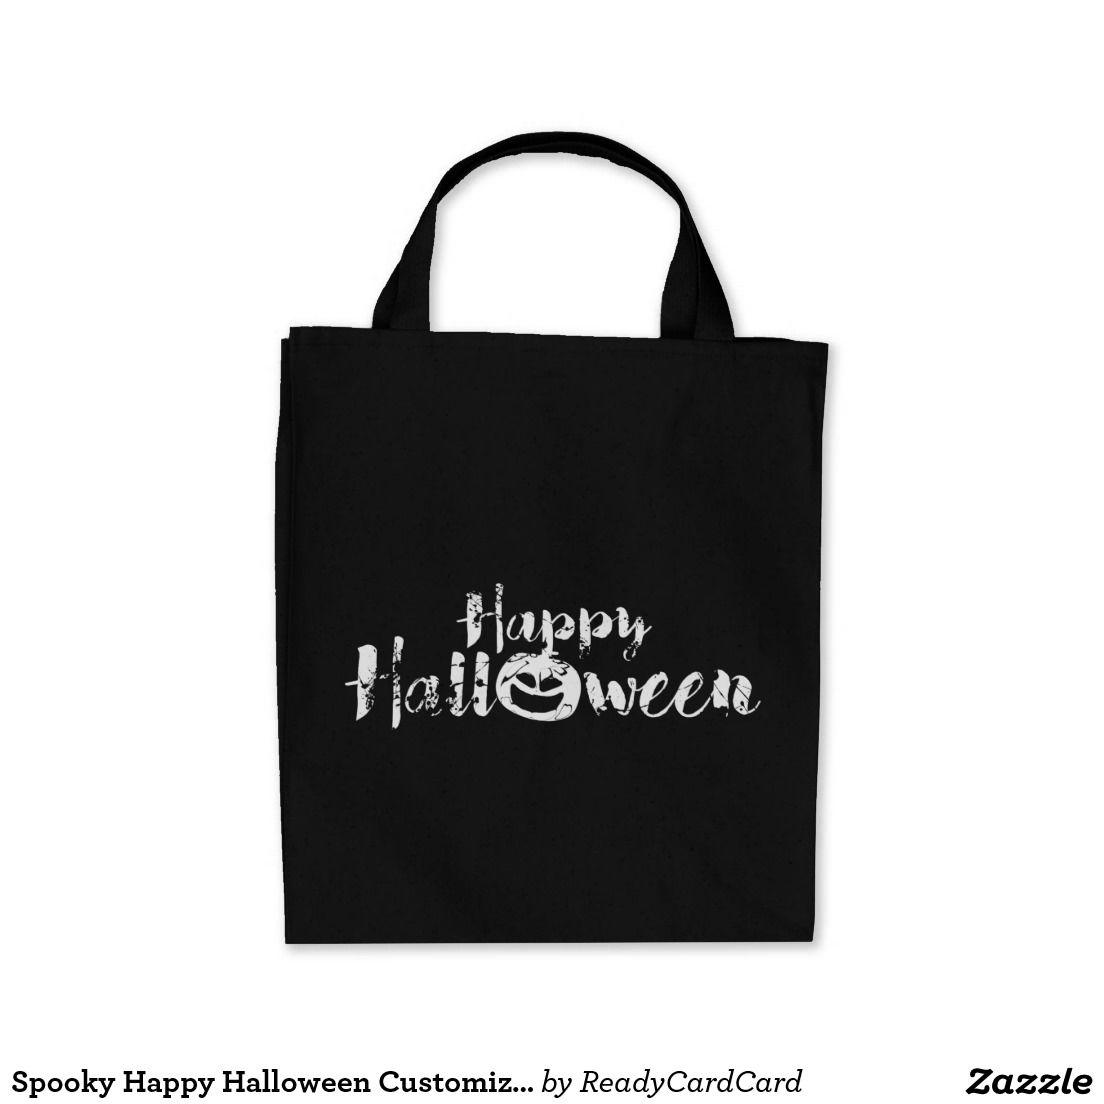 Spooky Happy Halloween Customizable Tote Bags